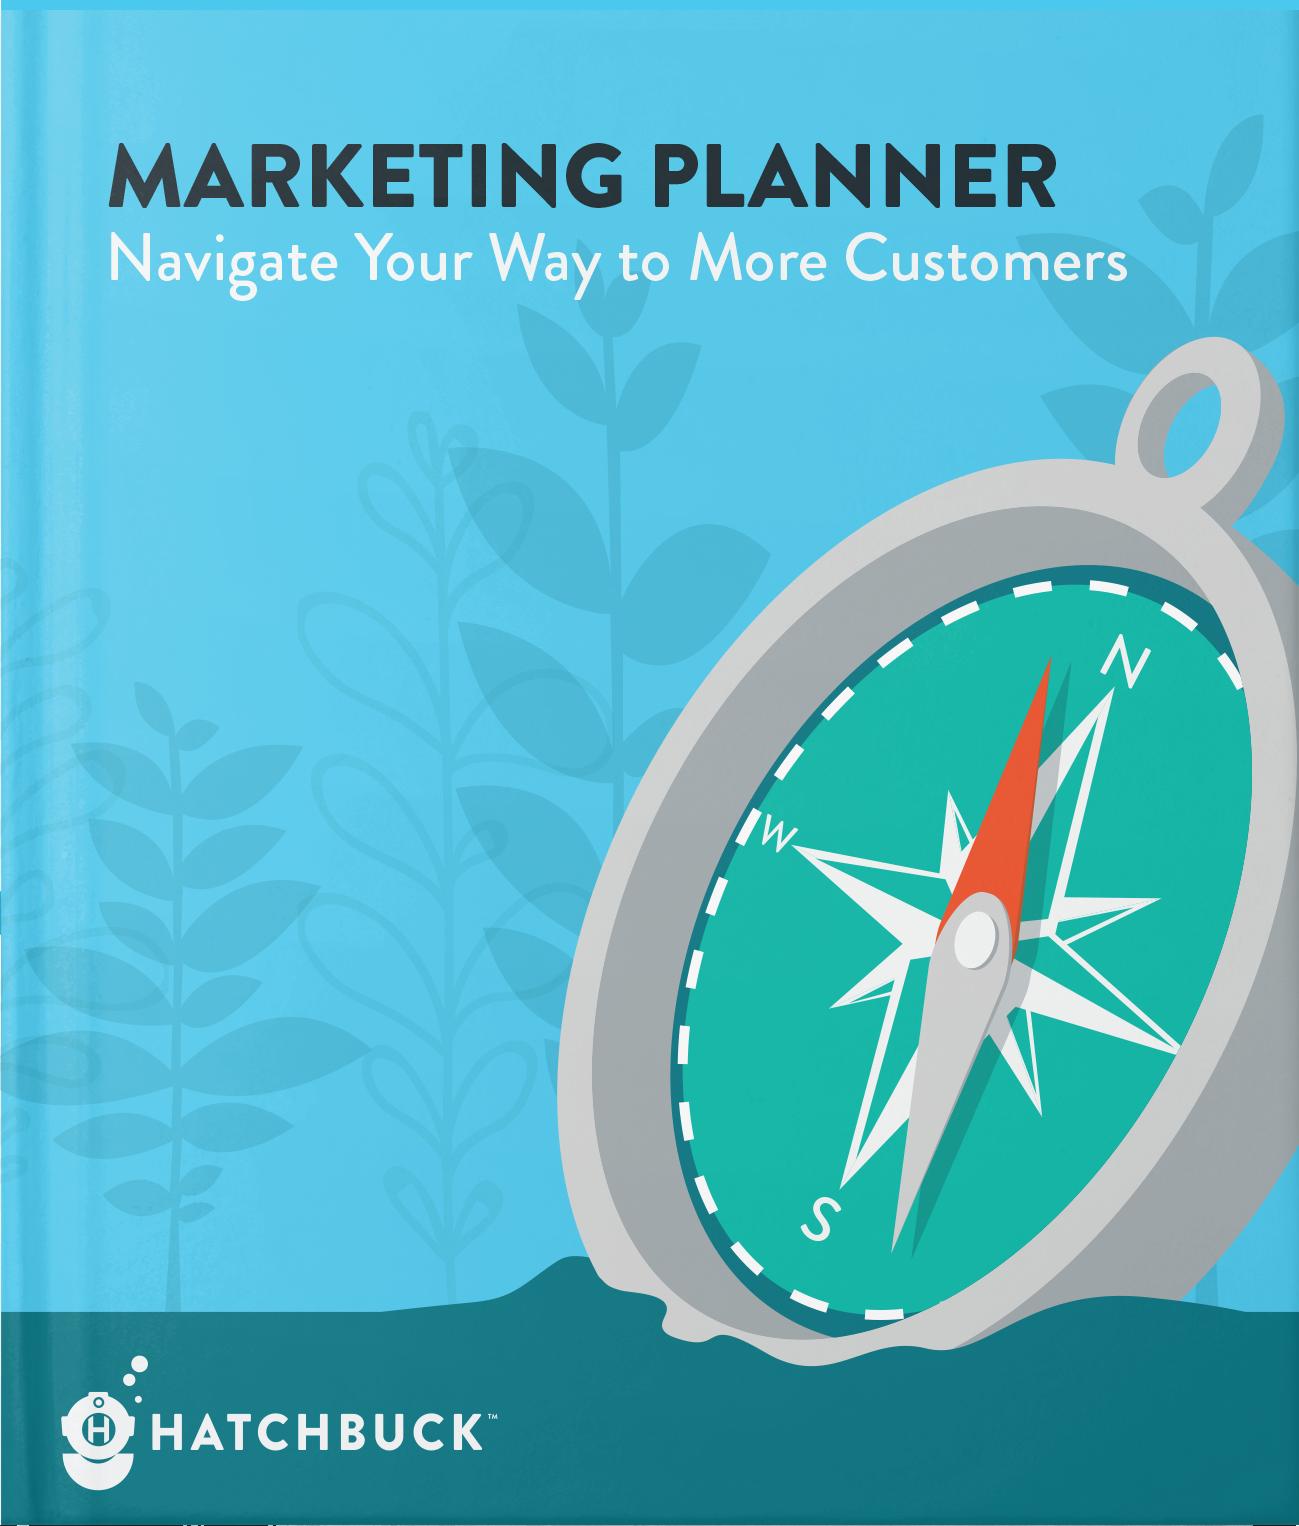 marketing planner large image